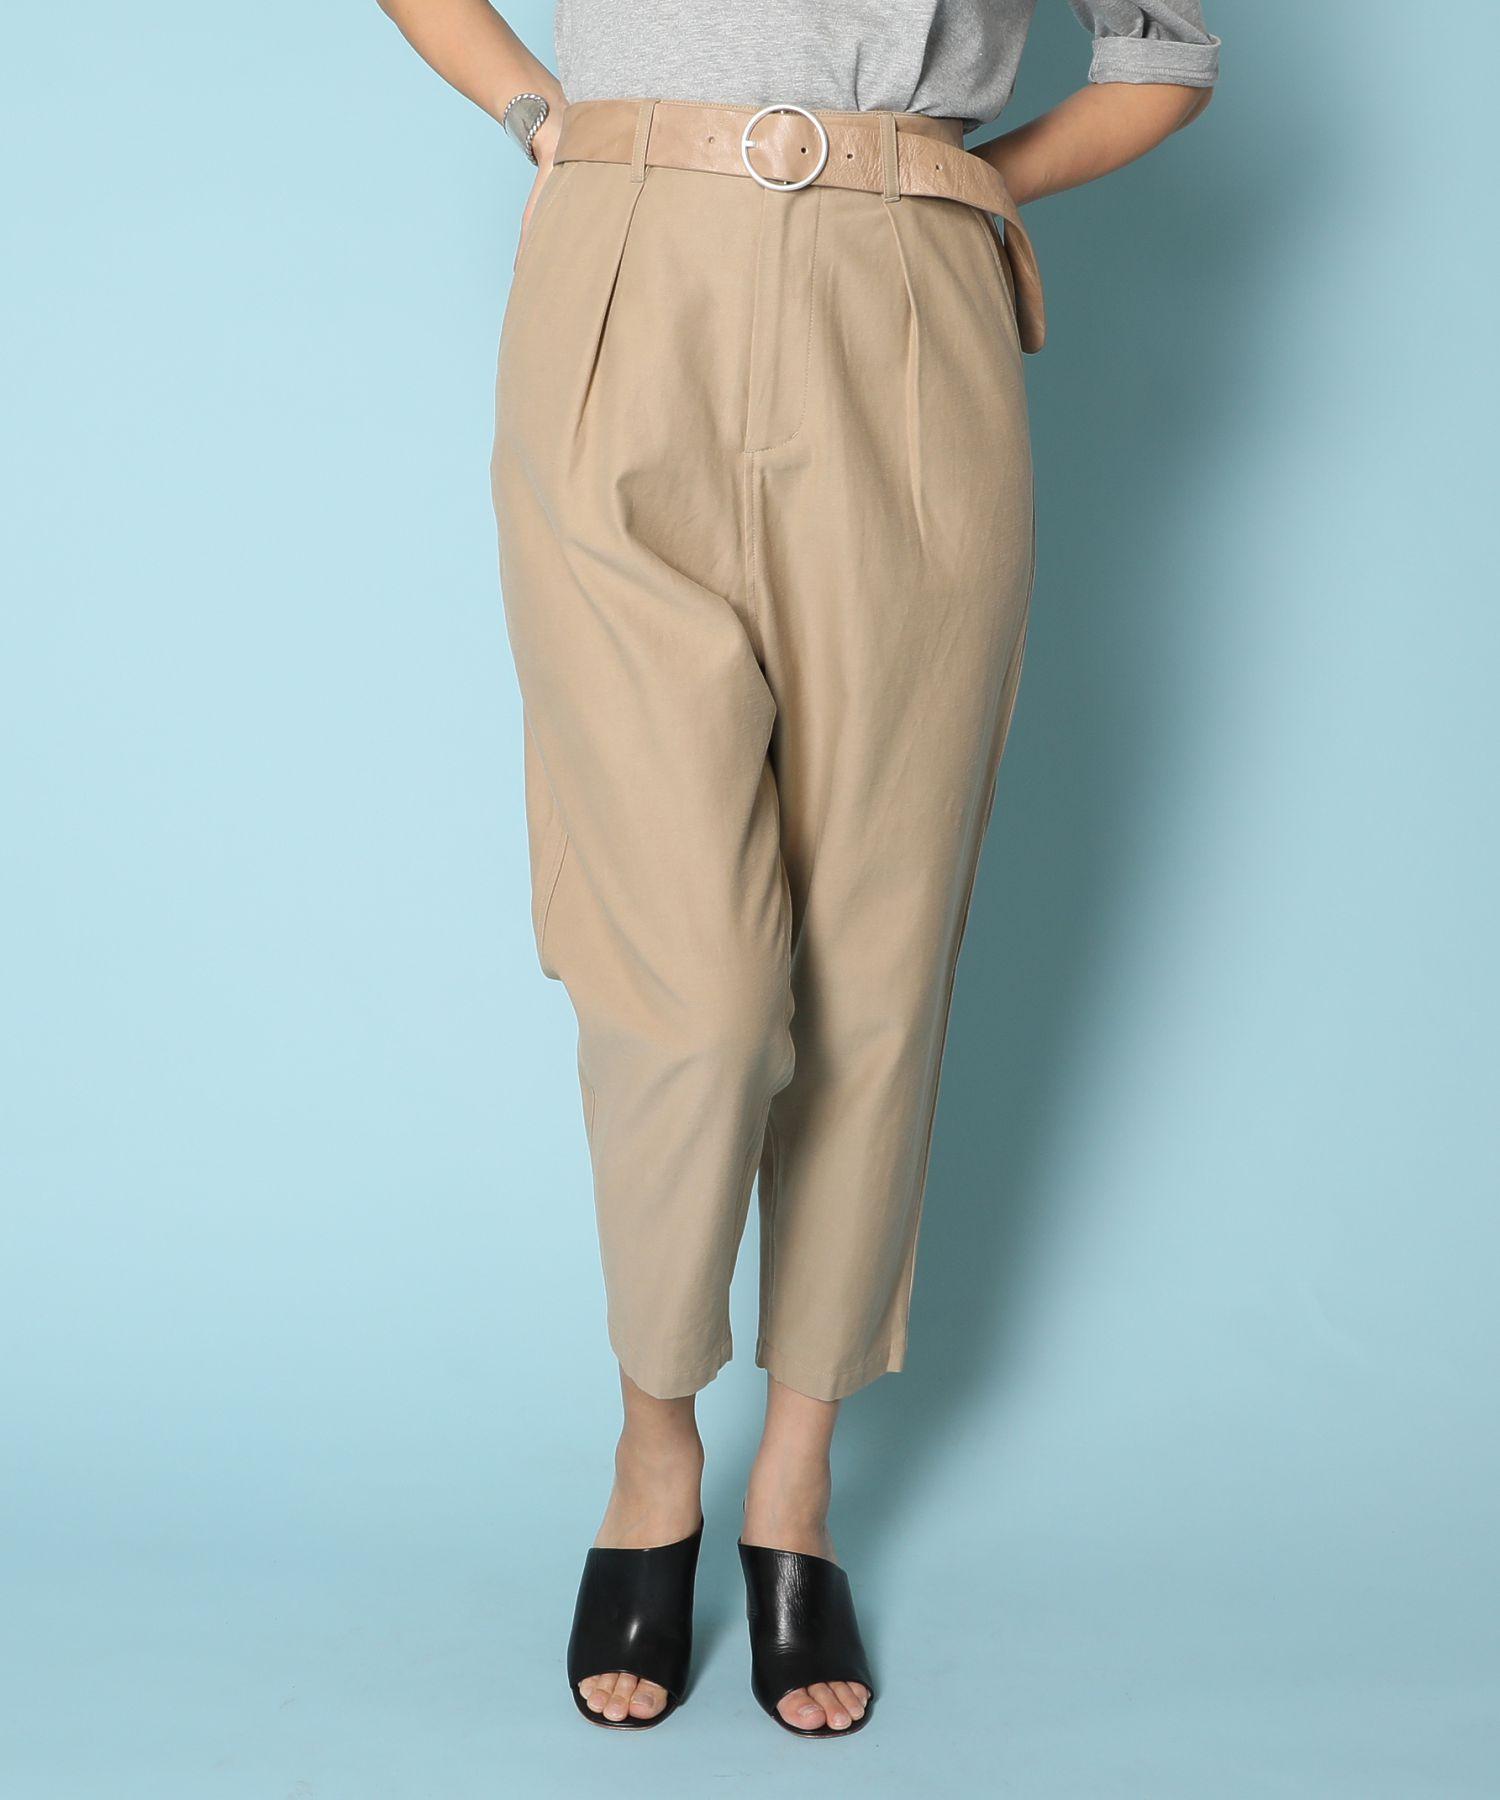 American Rag Cie Cropped Tapered Pants/アメリカンラグシー クロップドテーパードパンツ